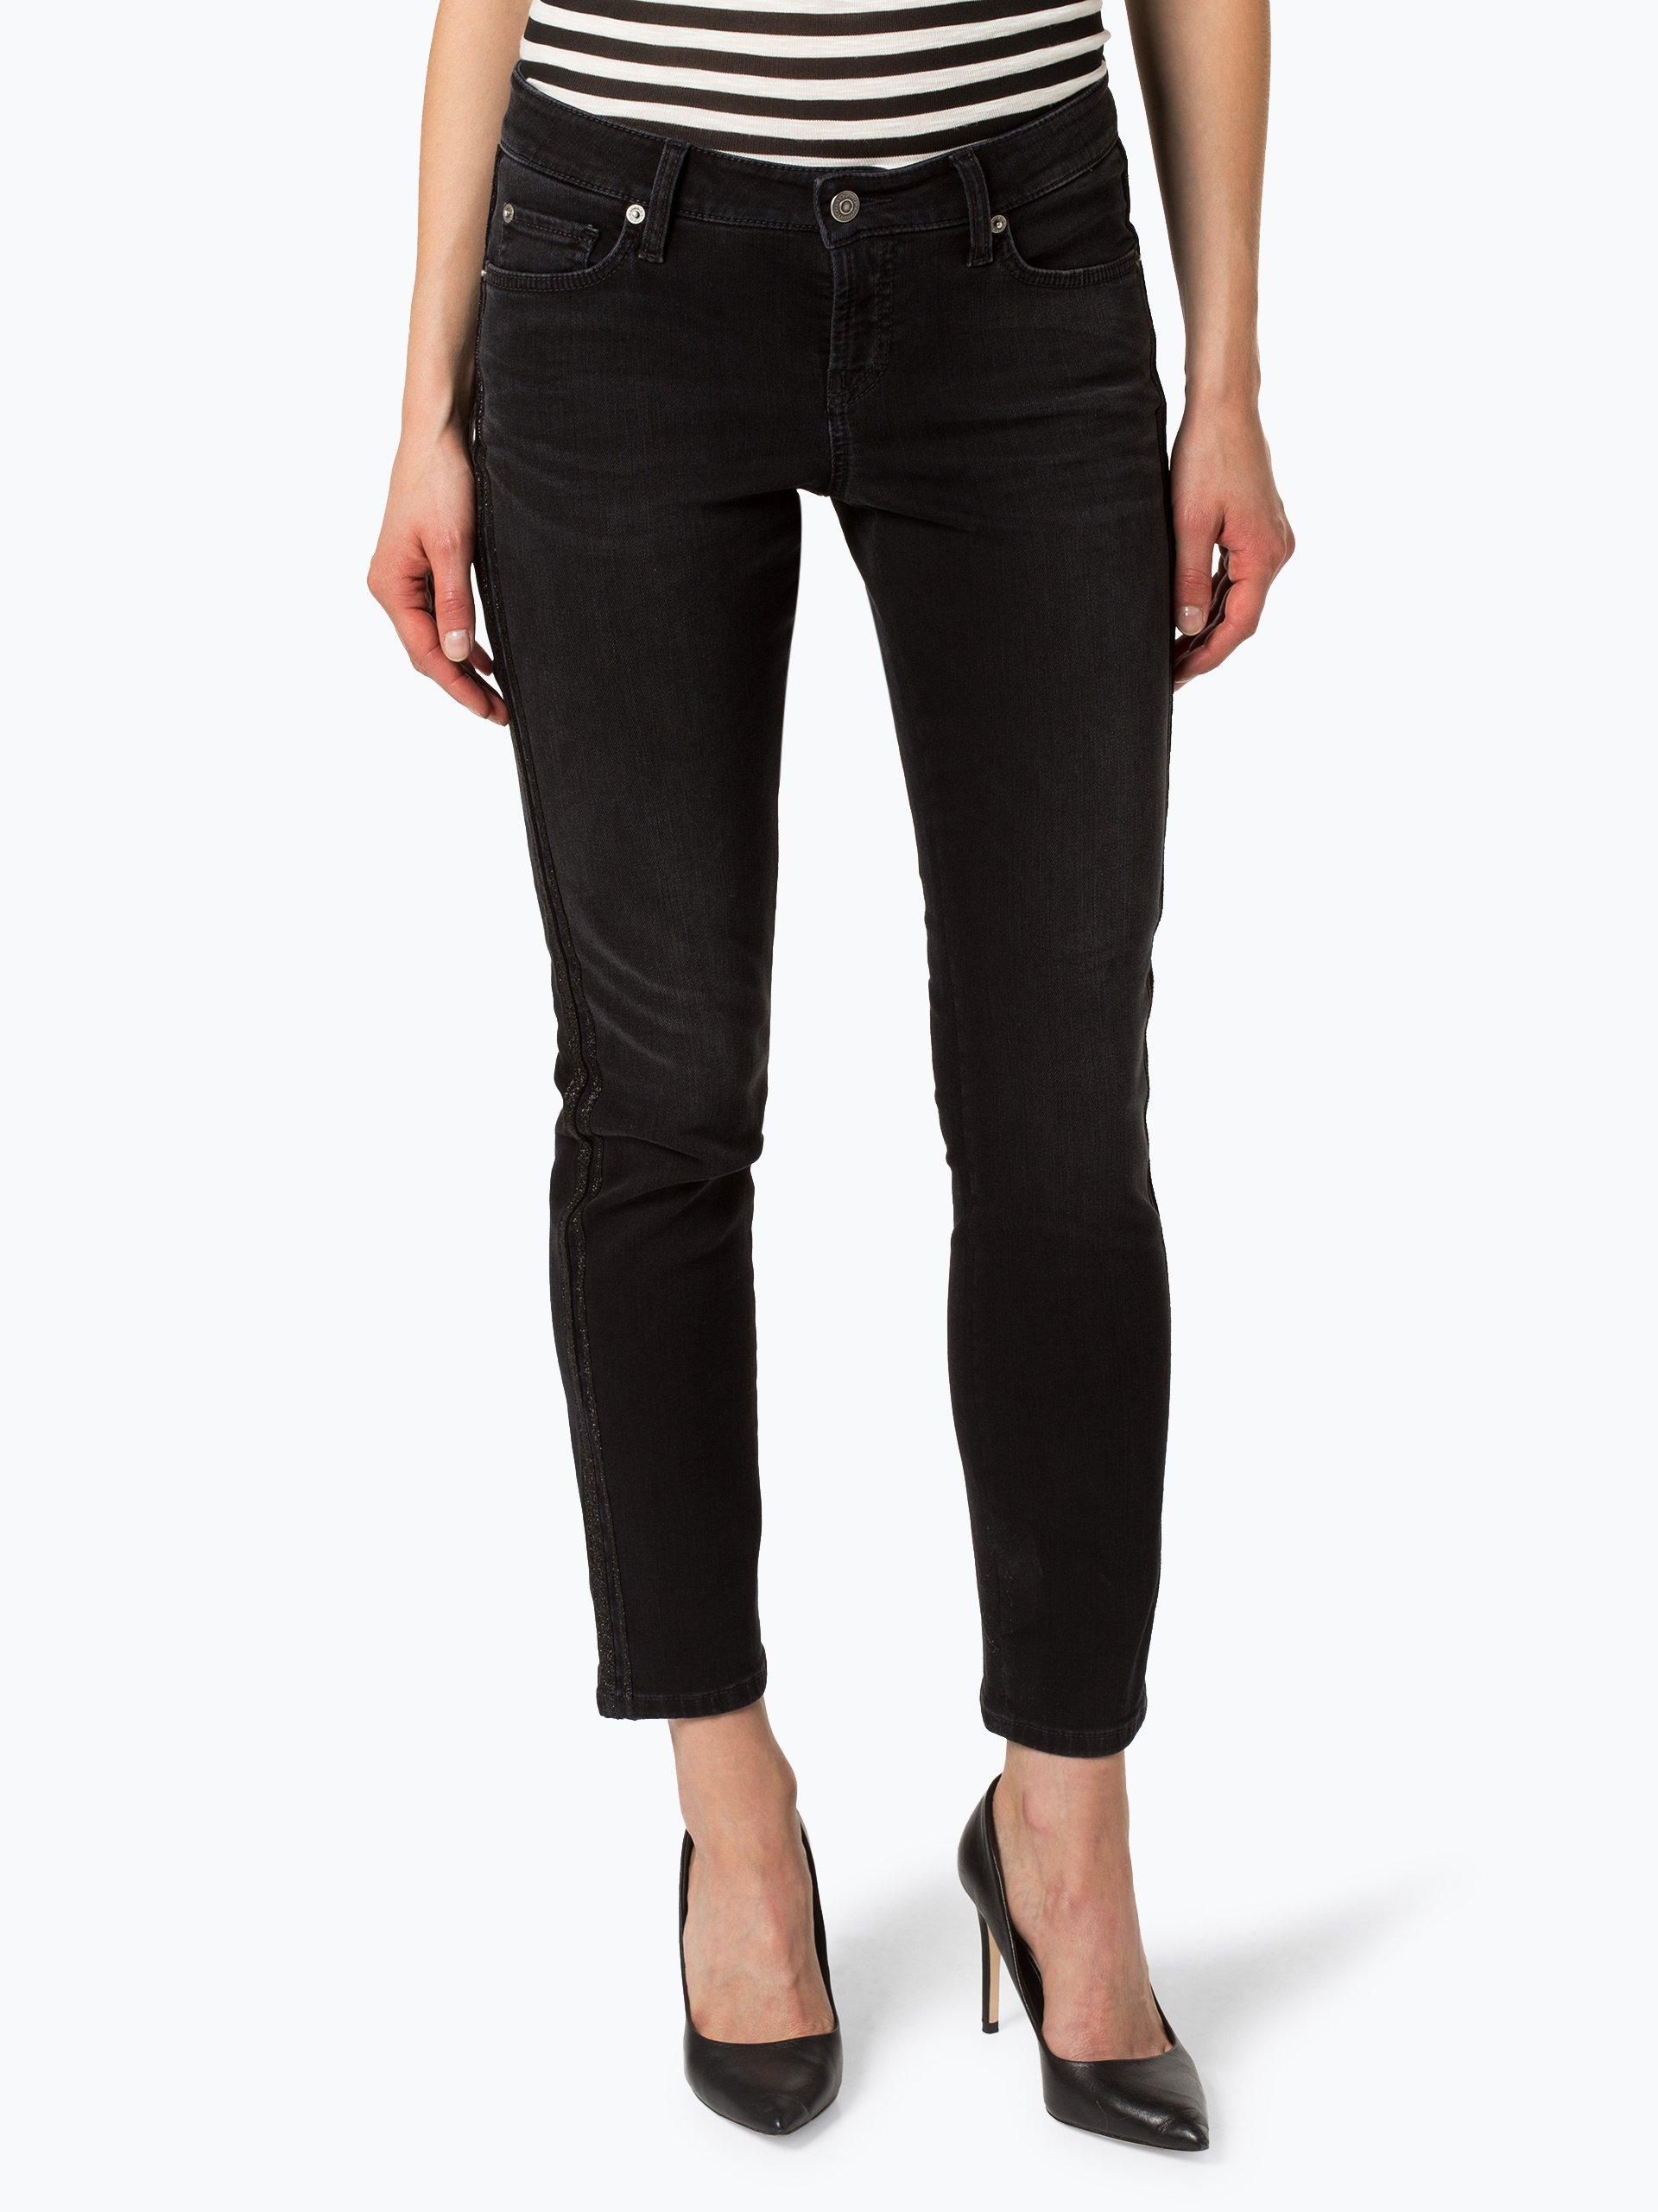 Cambio Damen Jeans - Liu